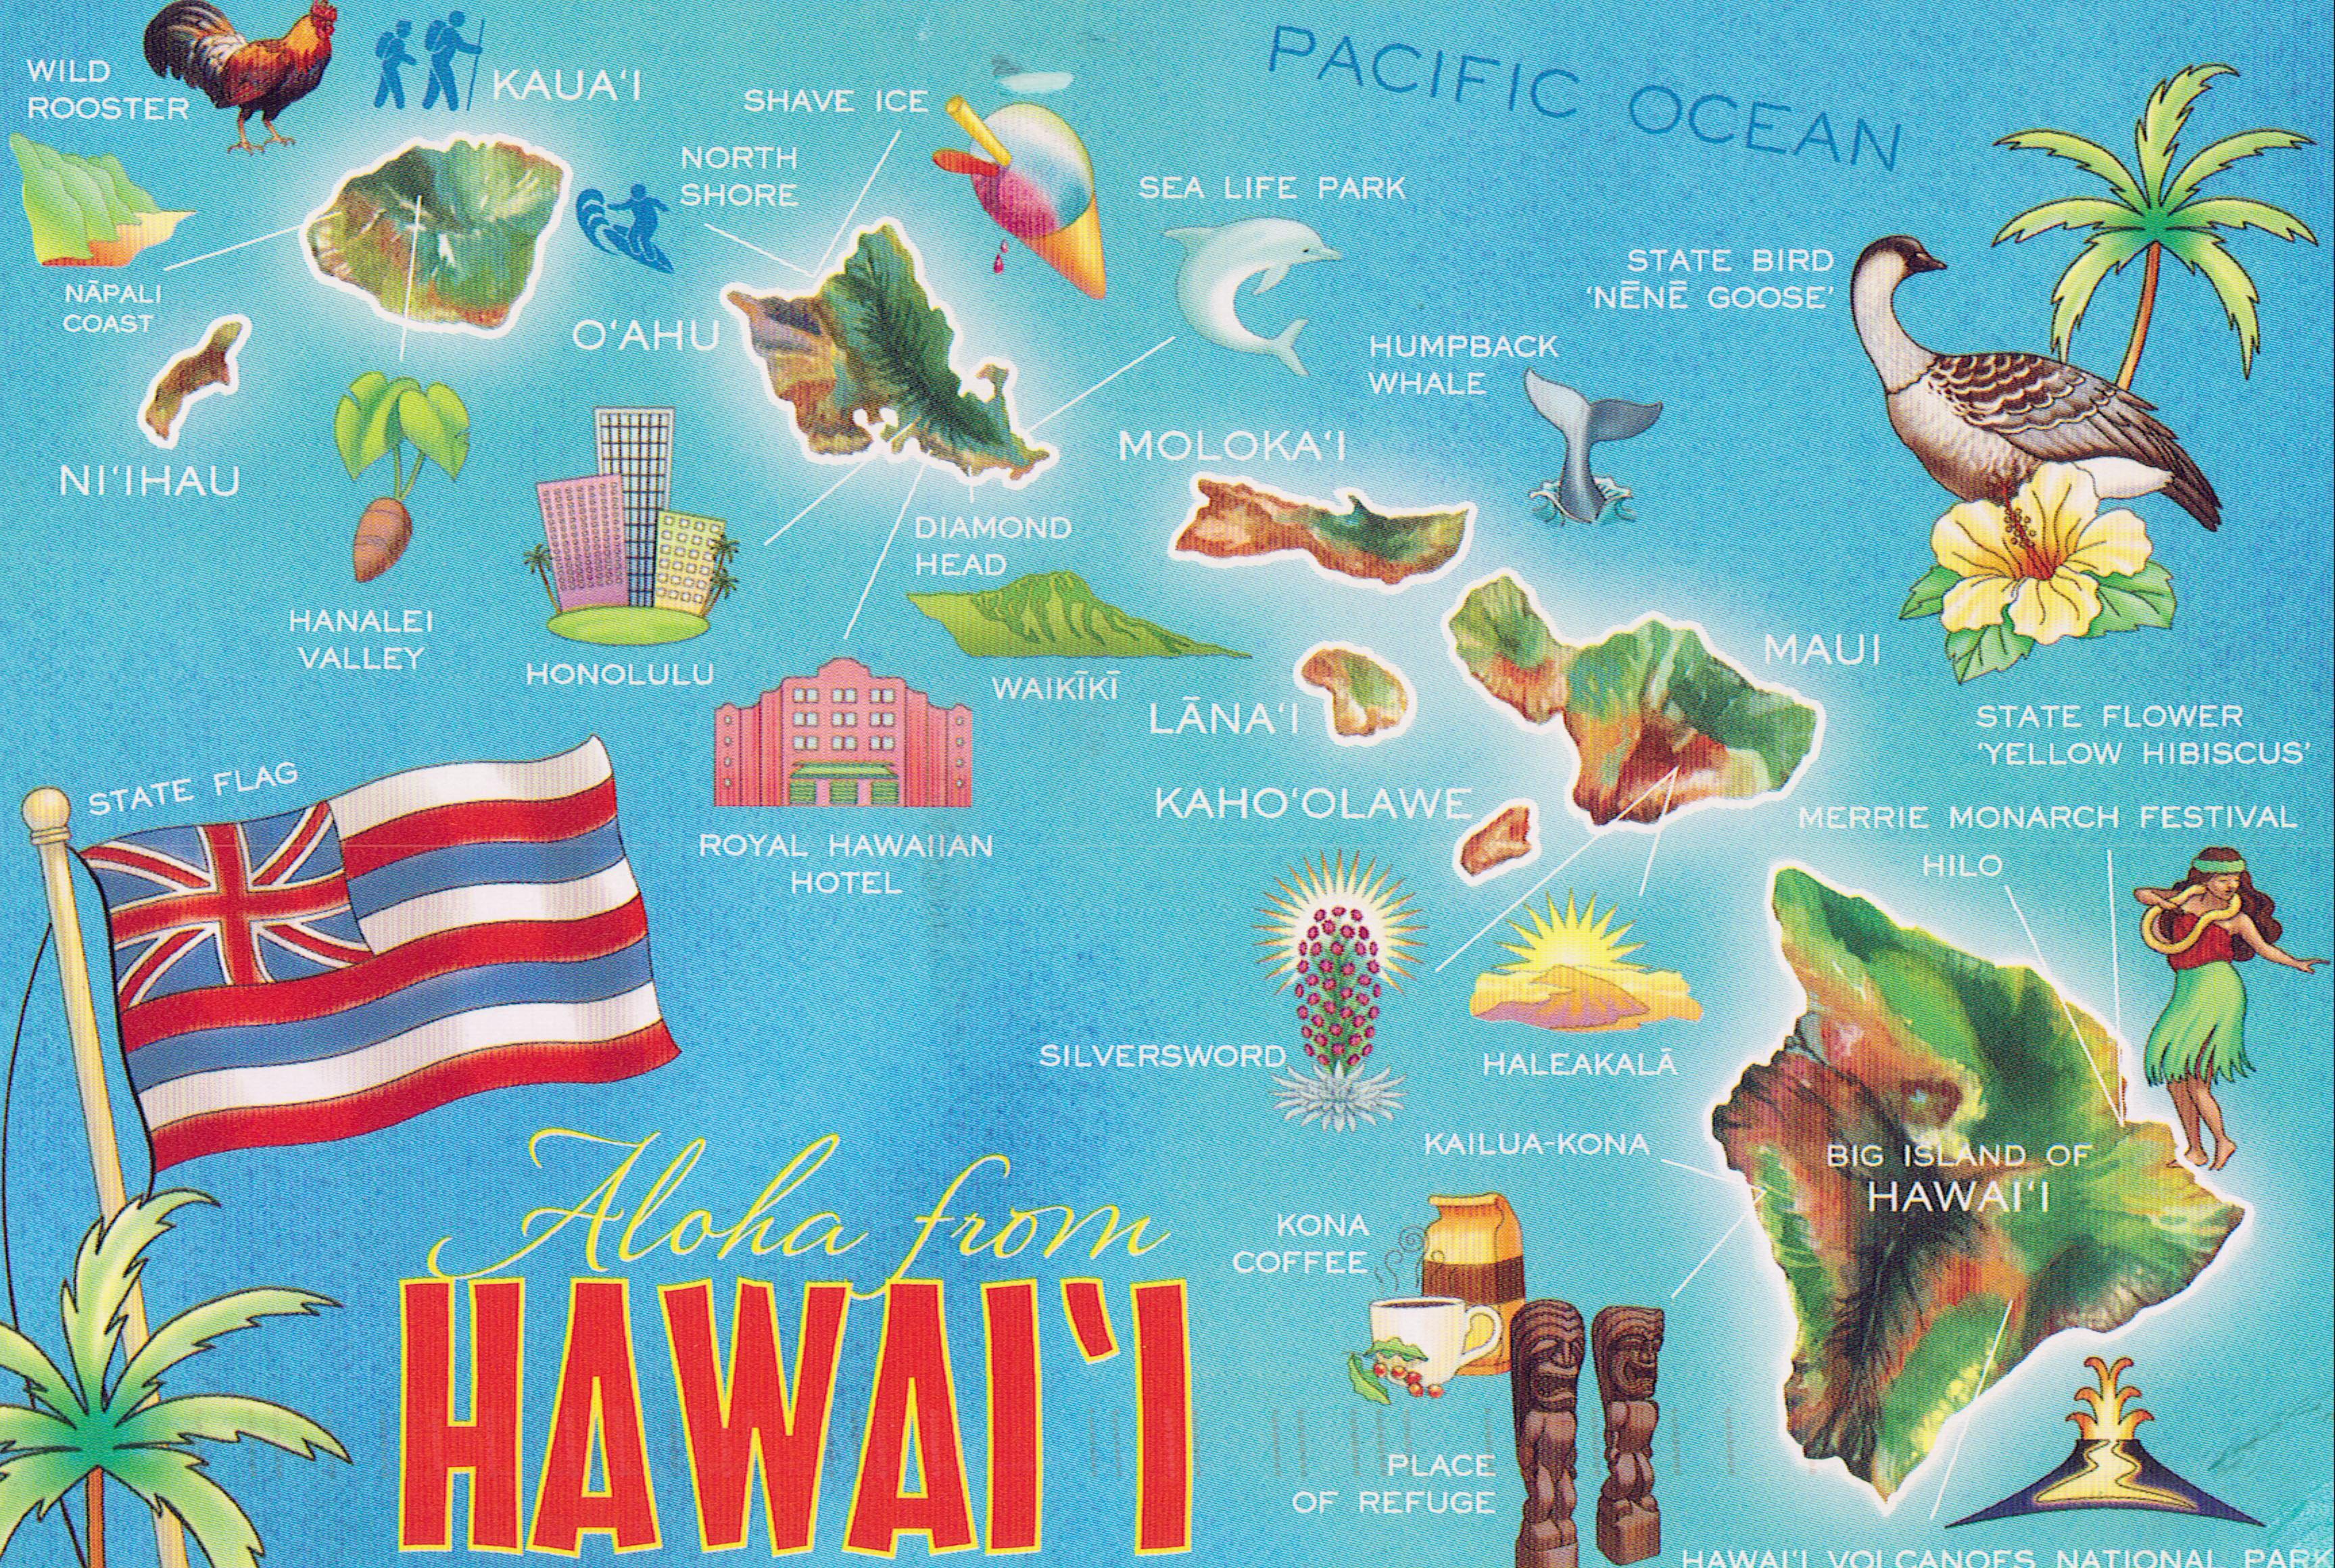 Large tourist map of Hawaii islands Hawaii state USA Maps of